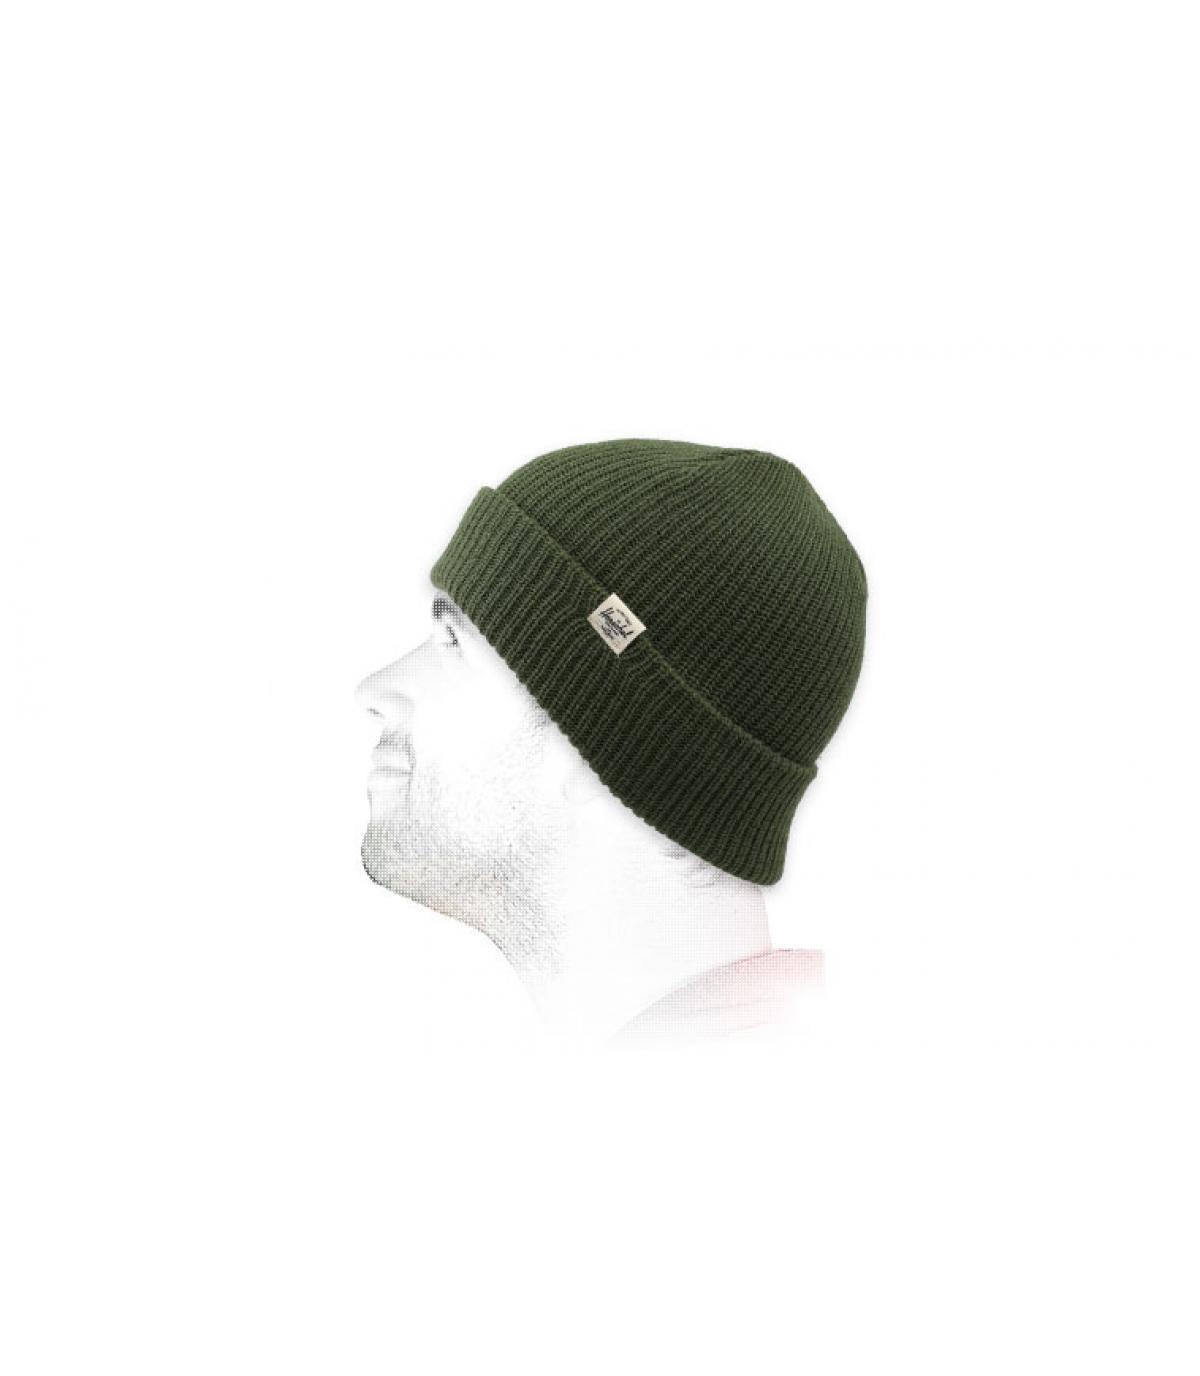 gorro solapa verde Herschel